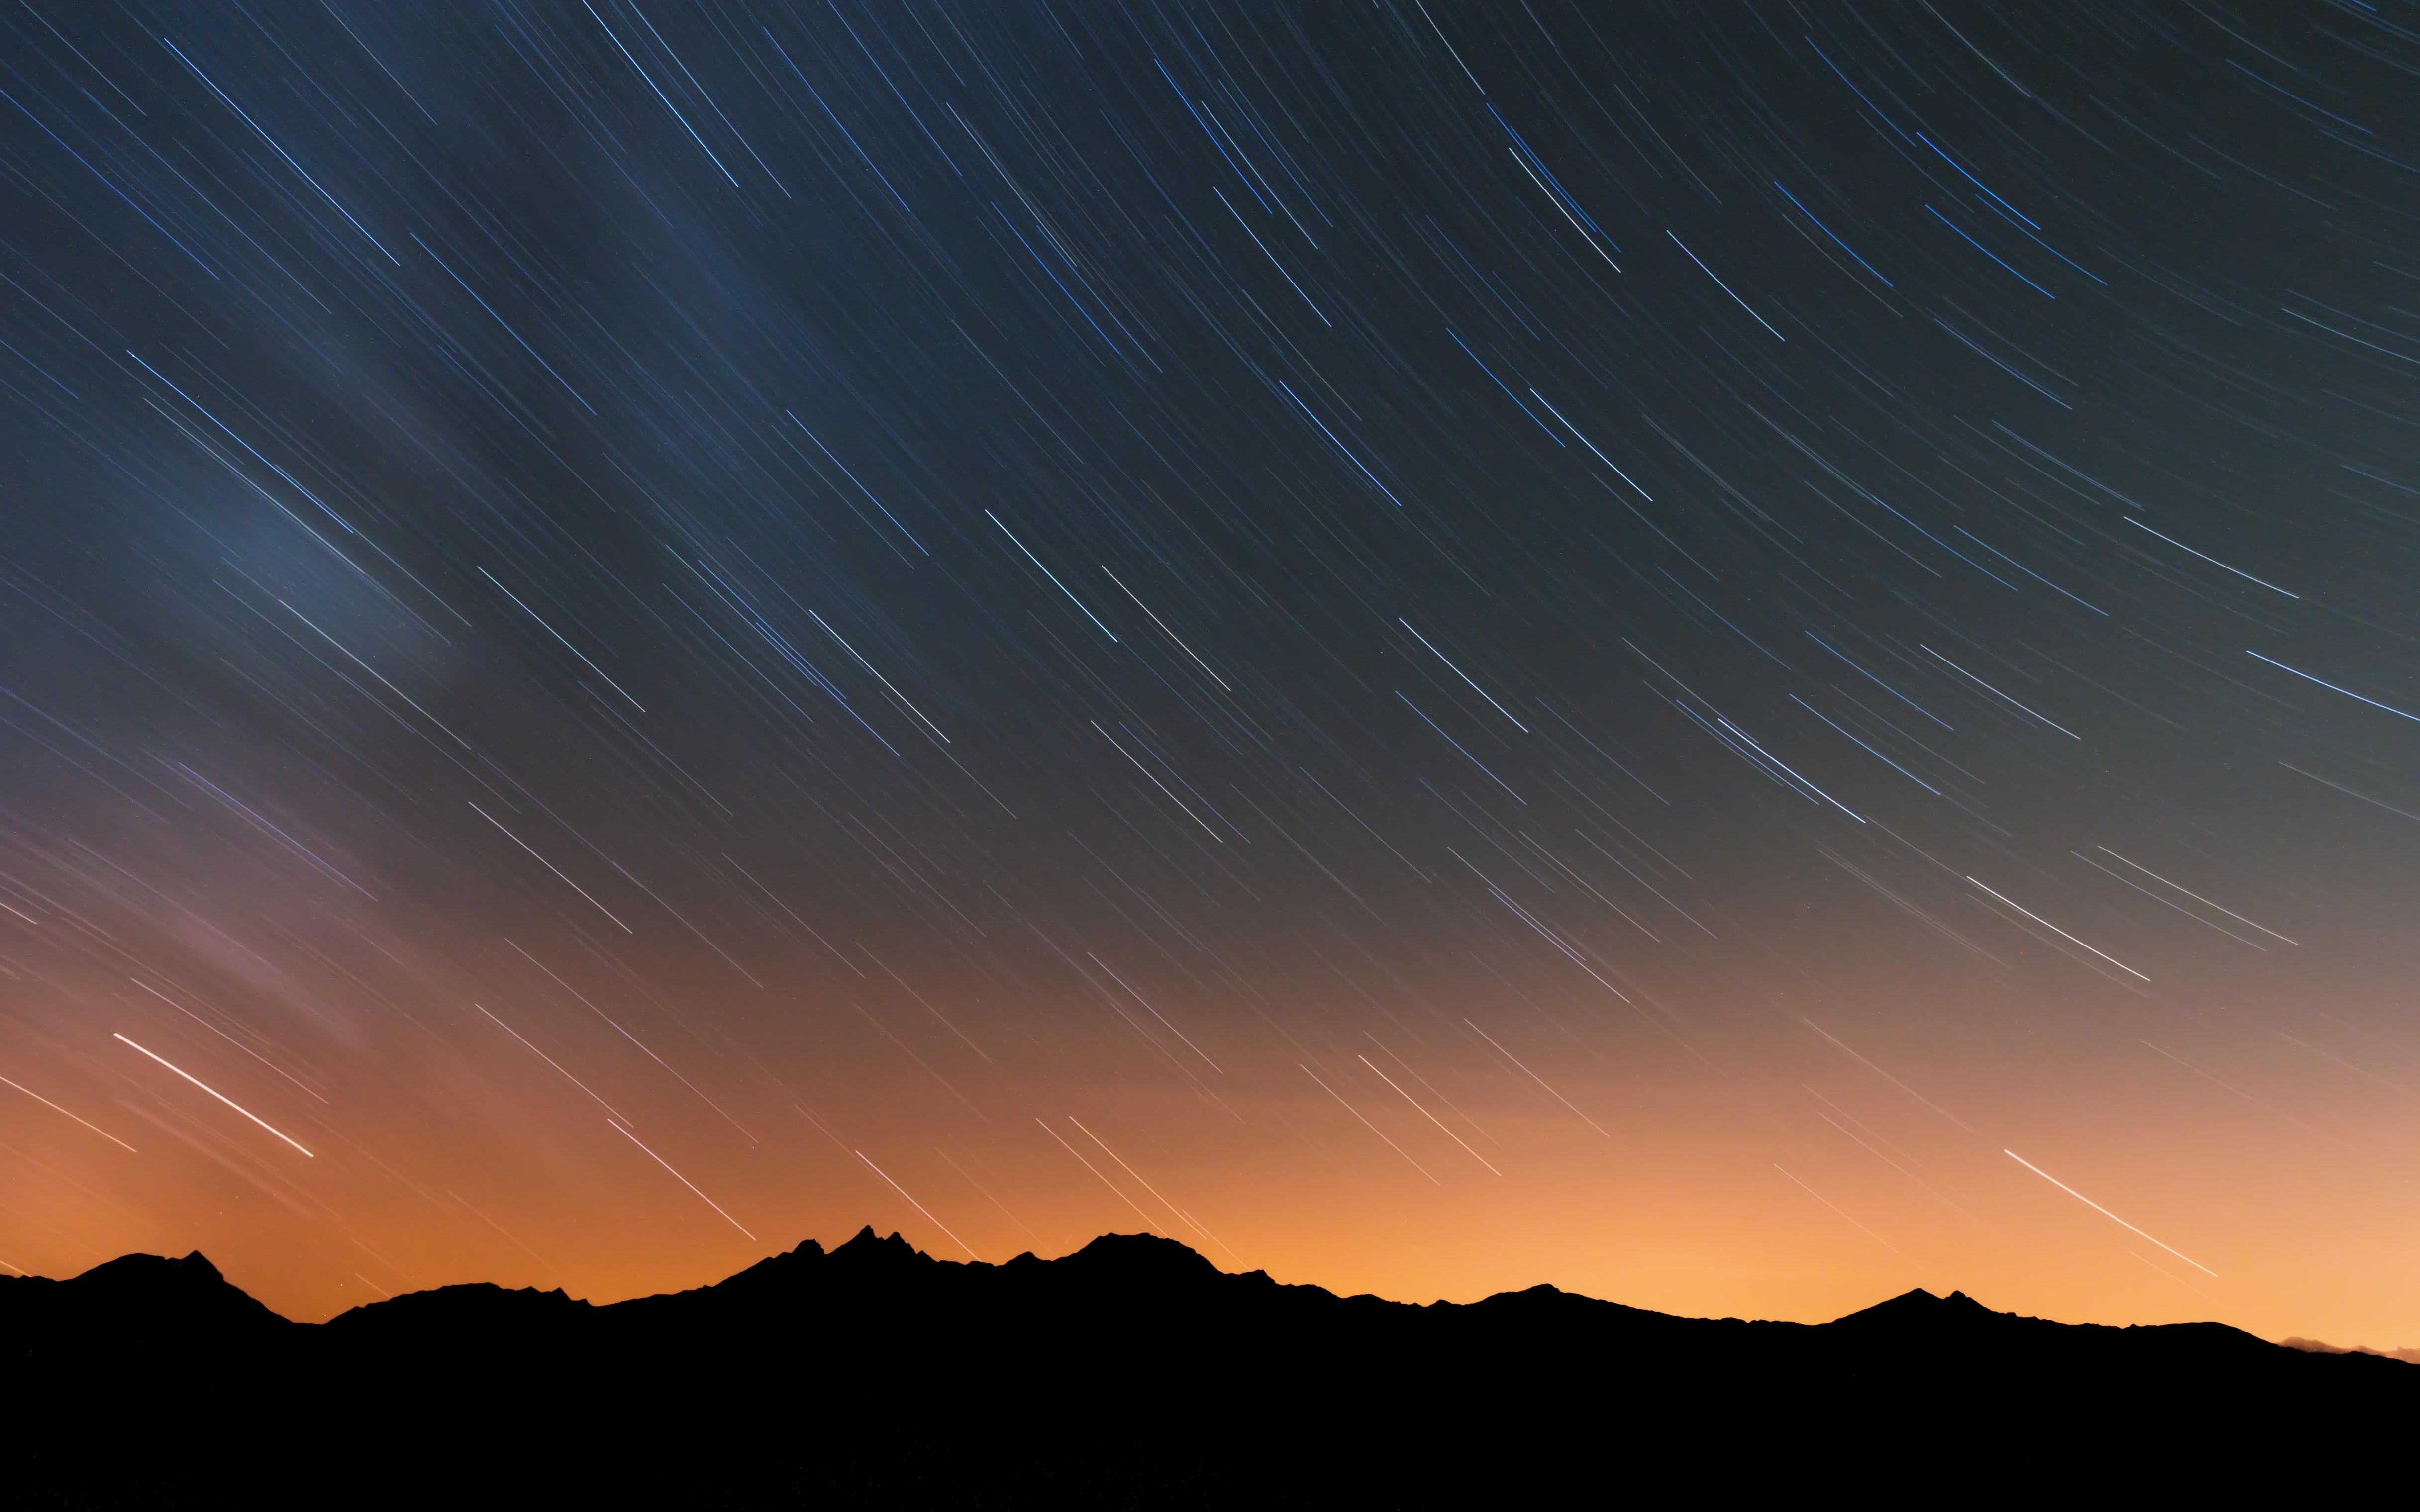 rain of stars over swiss alps 4k 1615197629 - Rain Of Stars Over Swiss Alps 4k - Rain Of Stars Over Swiss Alps 4k wallpapers